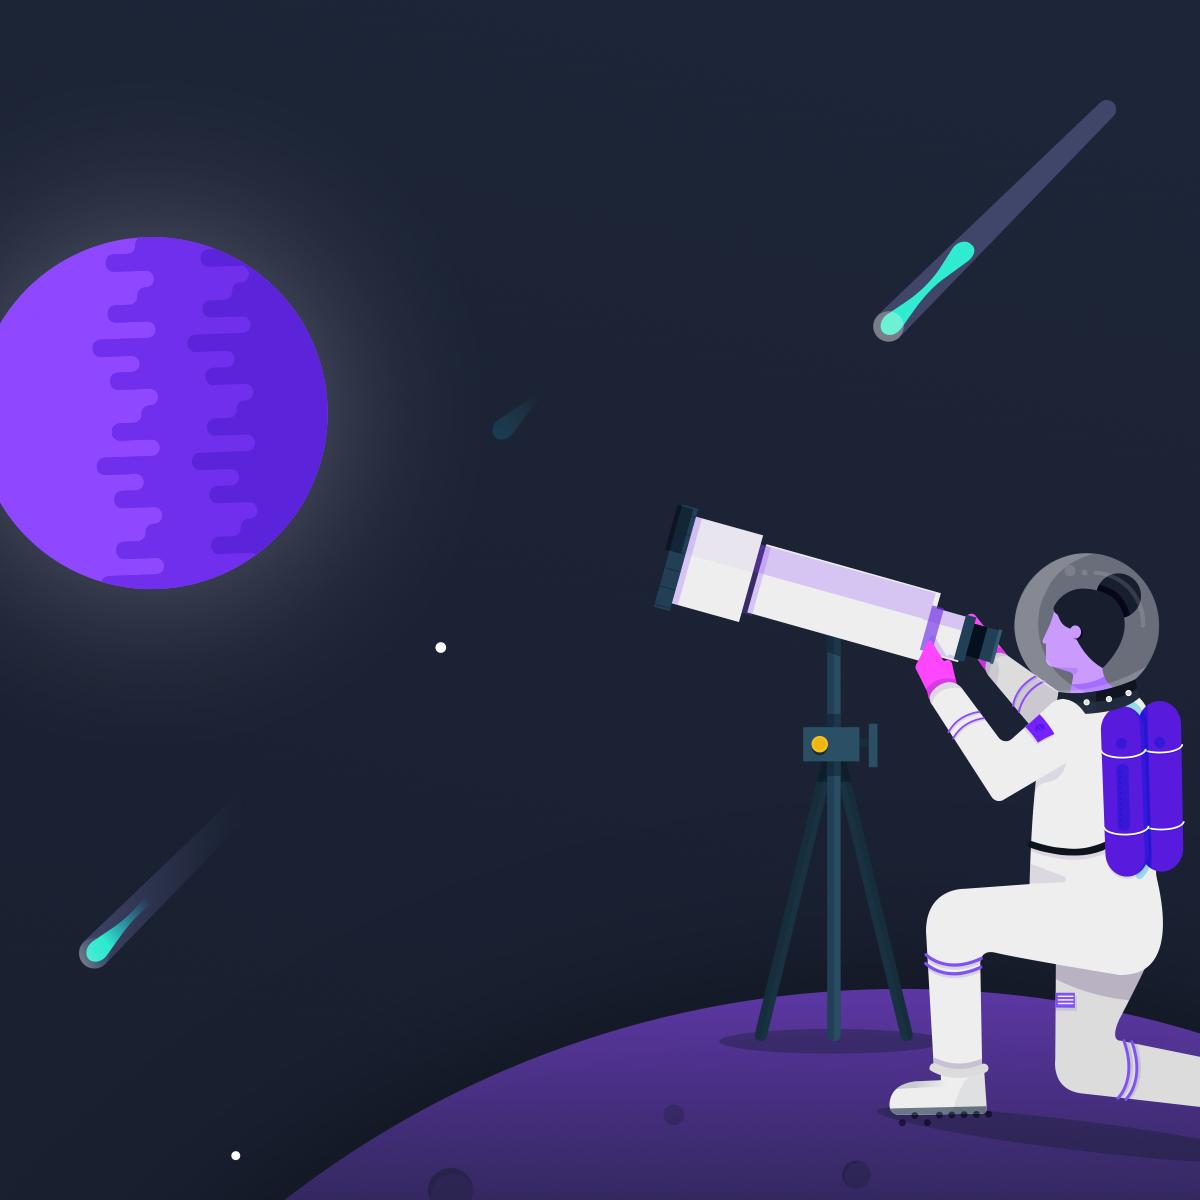 Spaceship — Invest Your Super in the Future